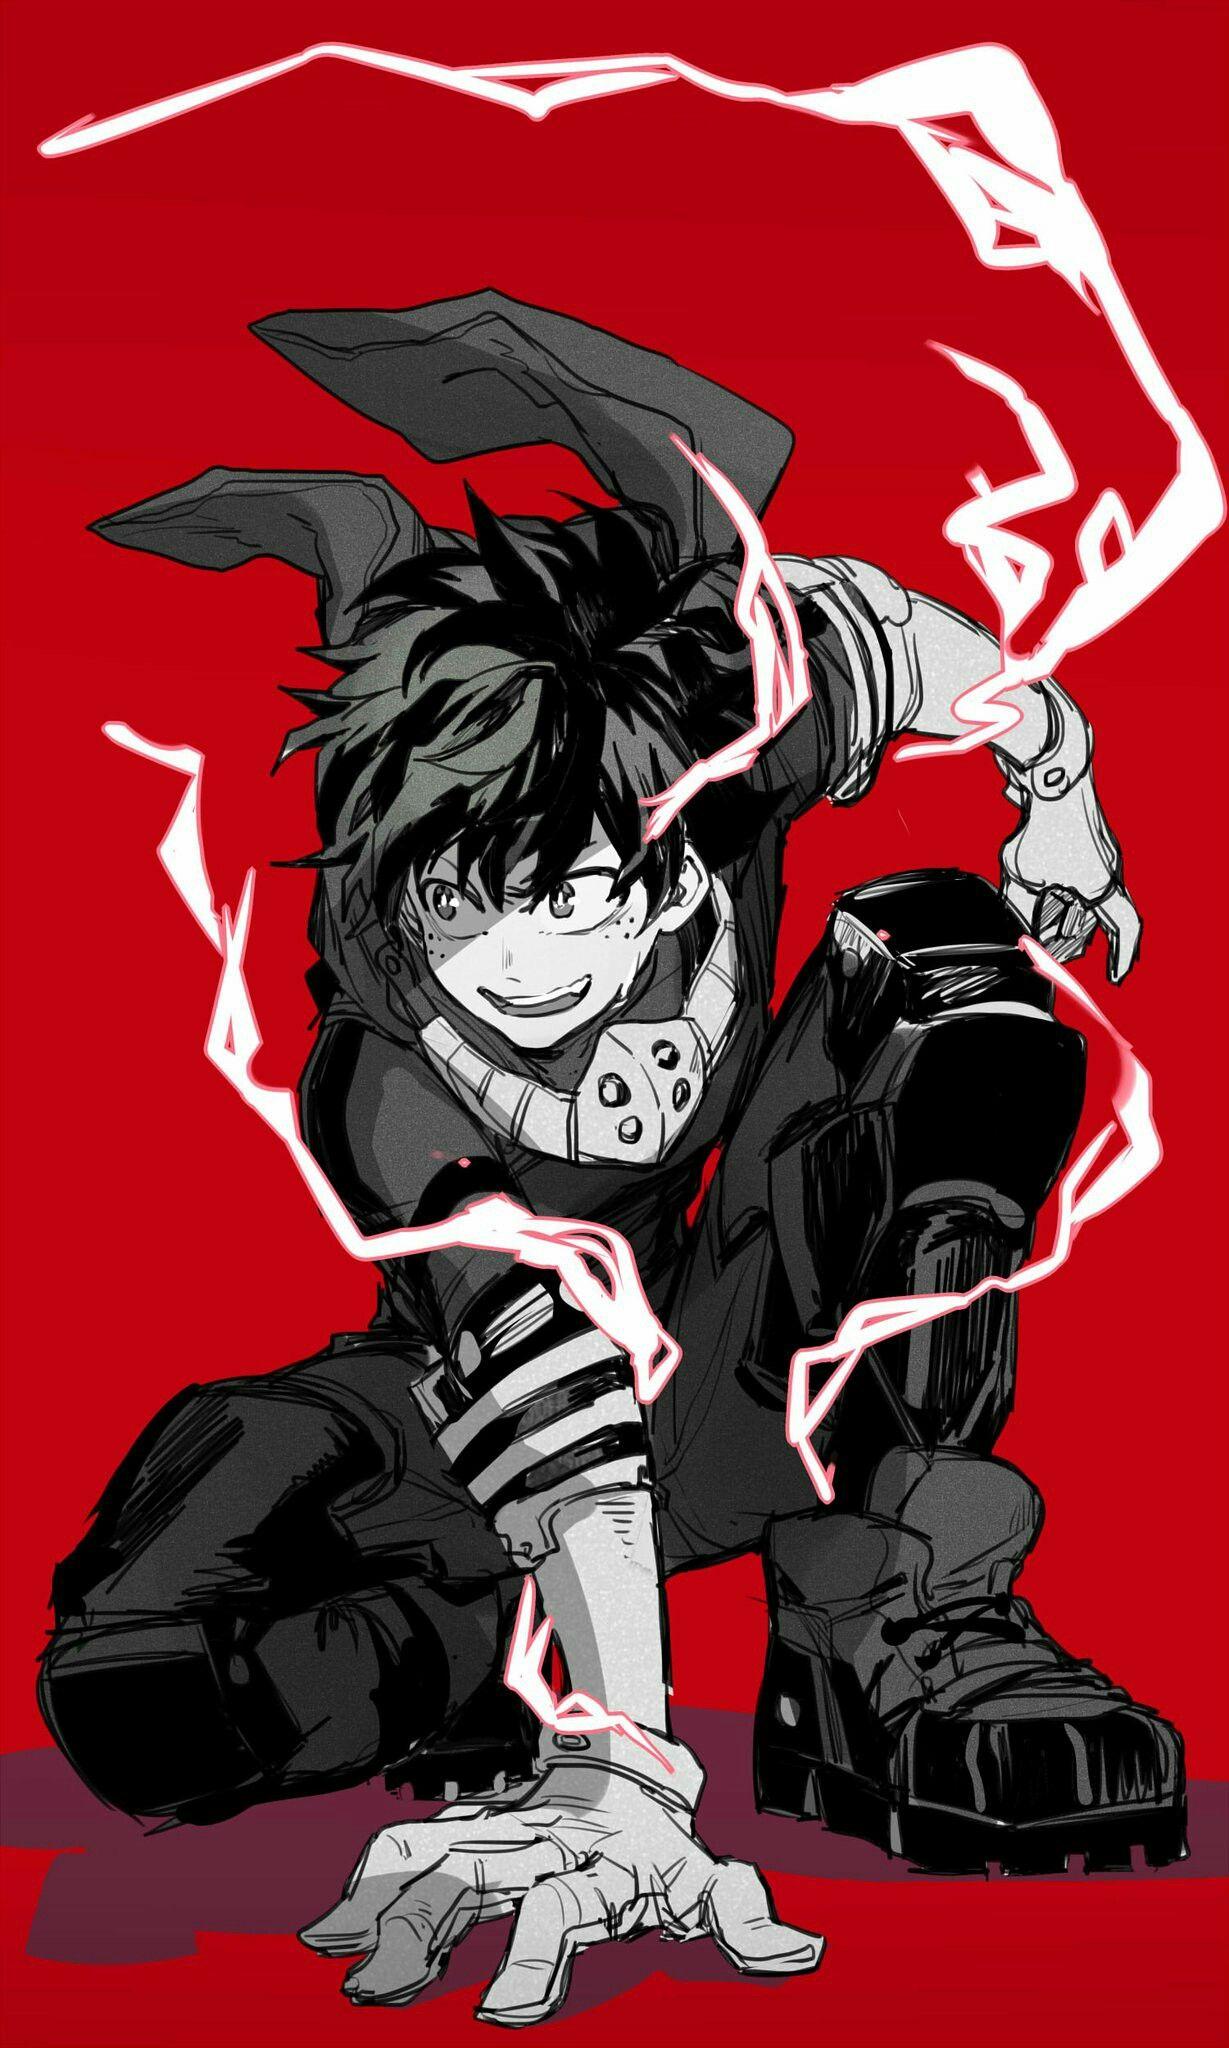 想像你一样跨越障碍 Karakter animasi, Animasi, dan Anime anak laki